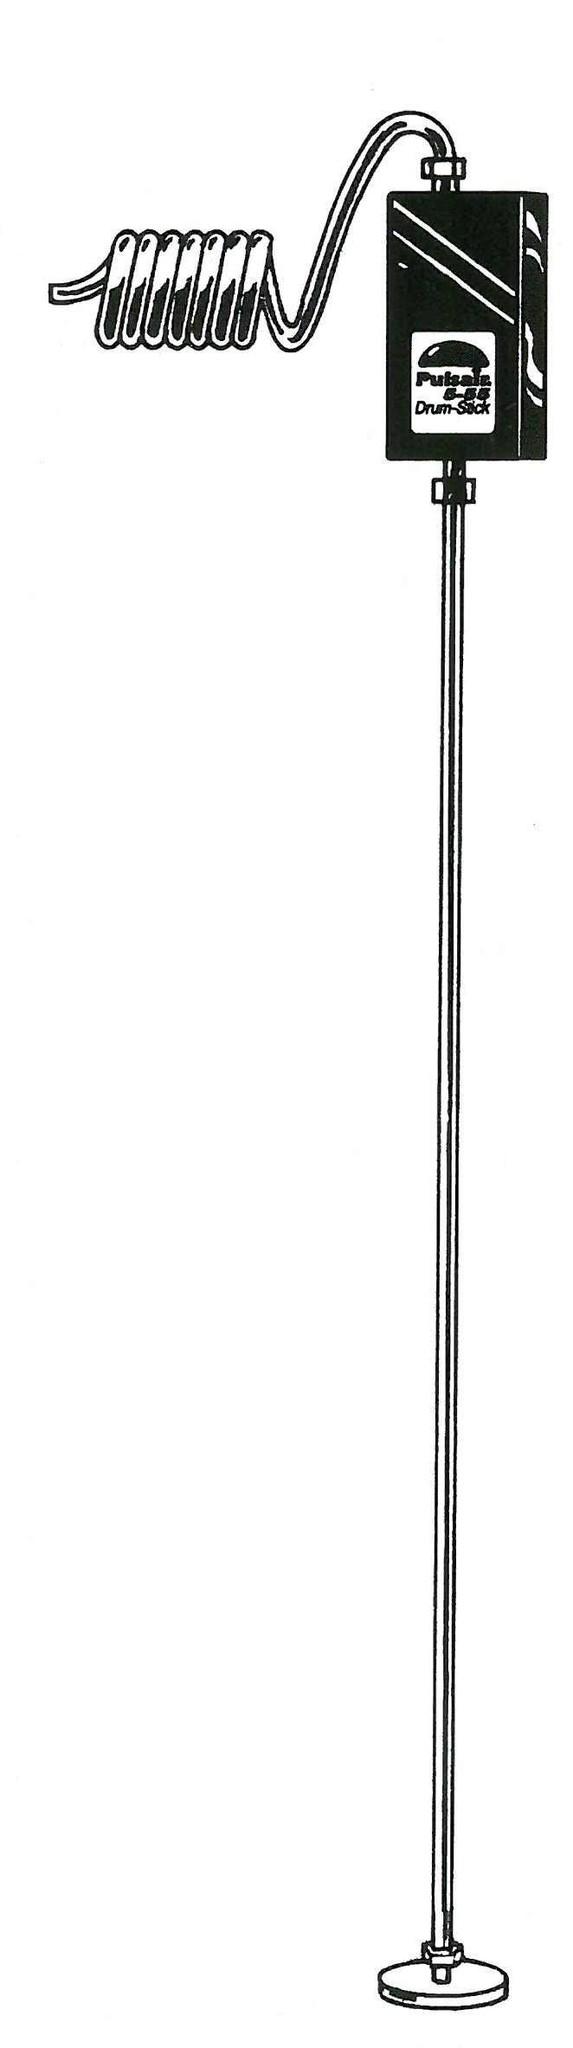 Fassmischer 'Pulsair'